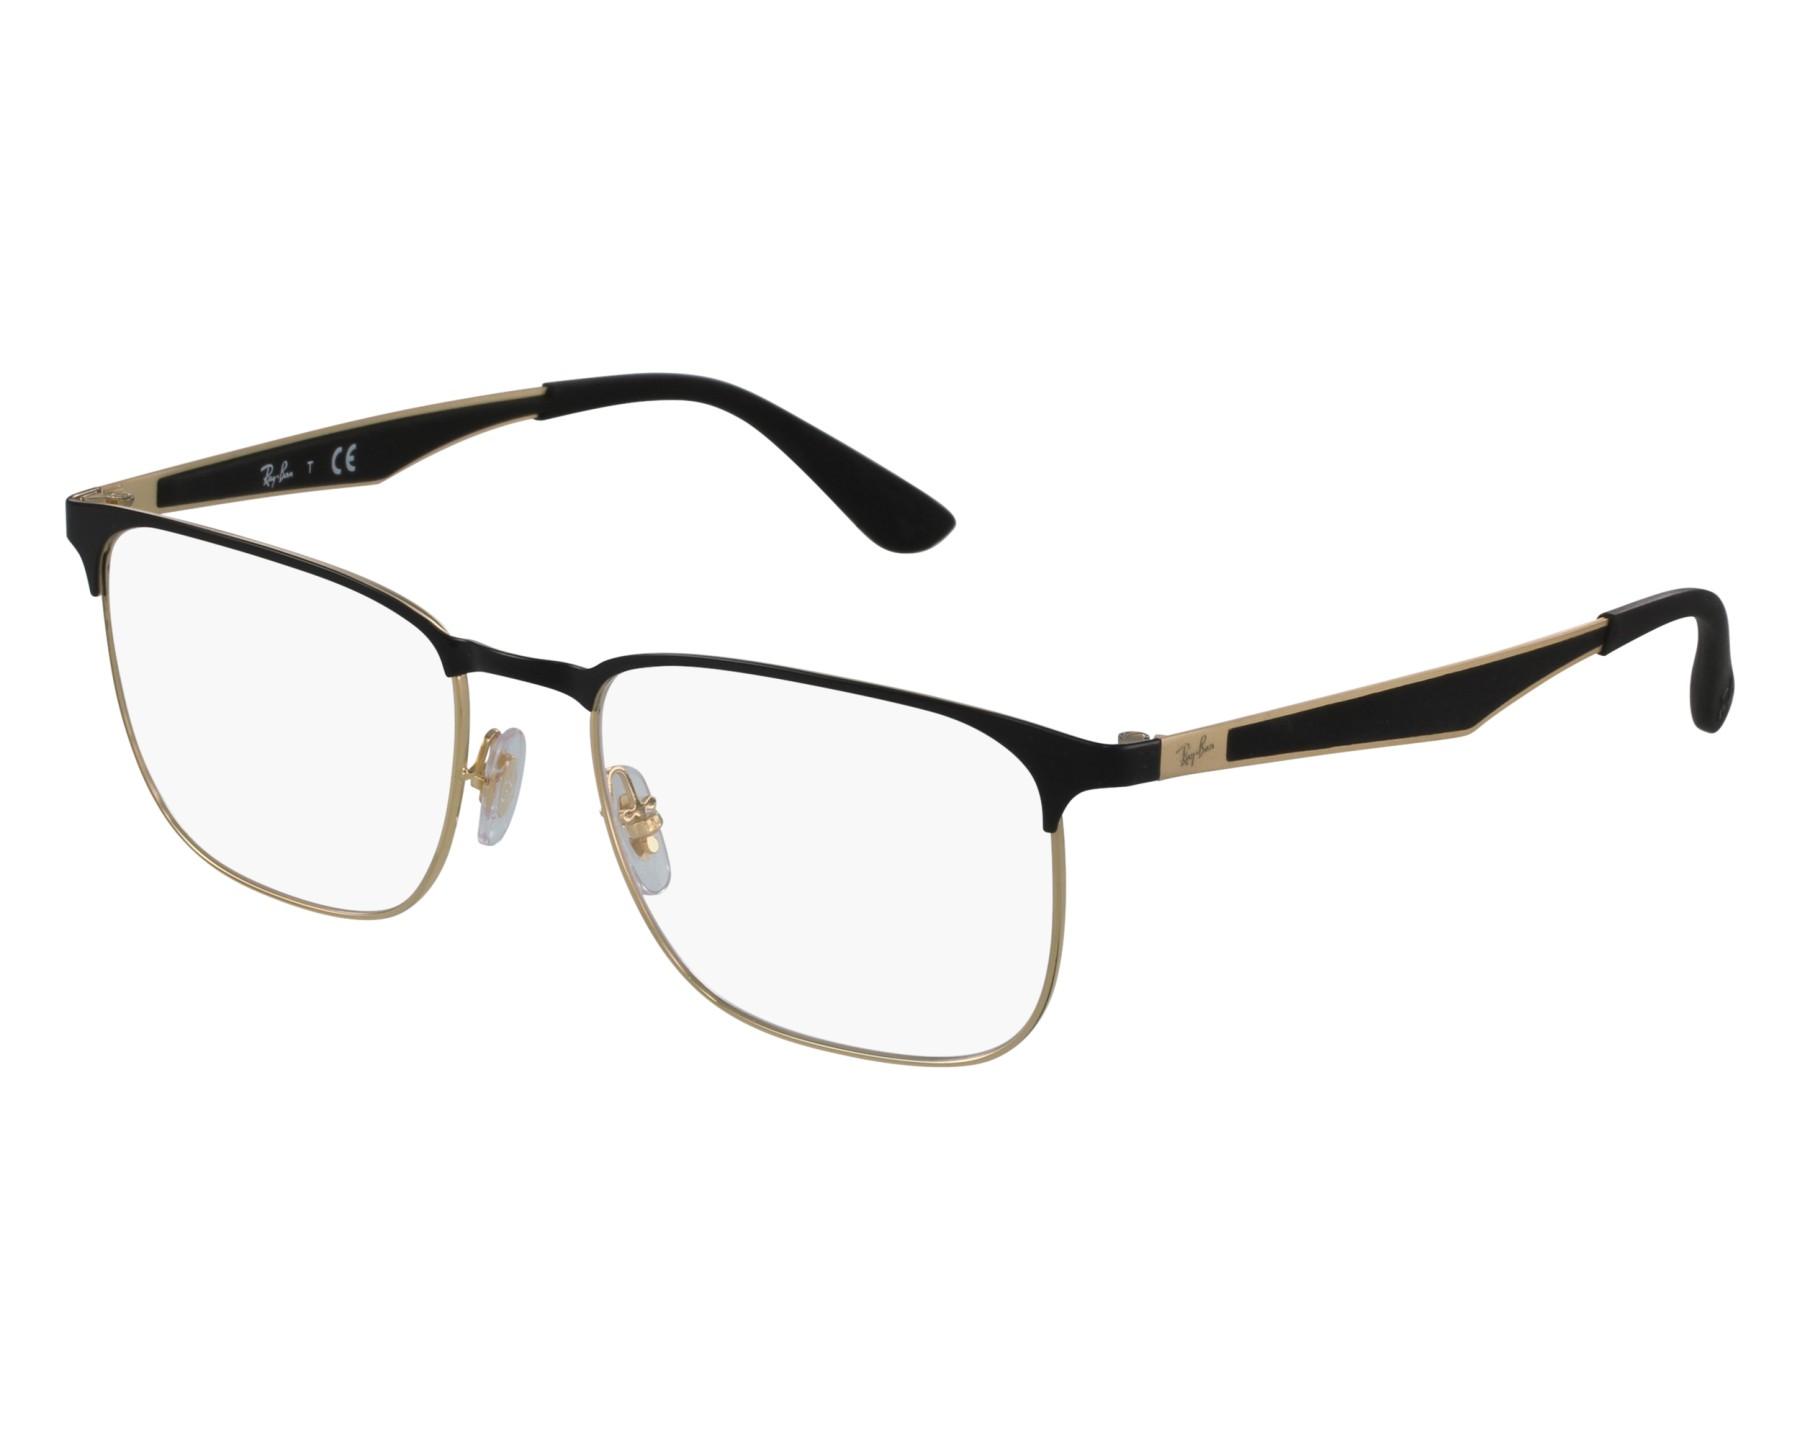 20cdfc52b60 eyeglasses Ray-Ban RX-6363 2890 54-18 Black Gold front view